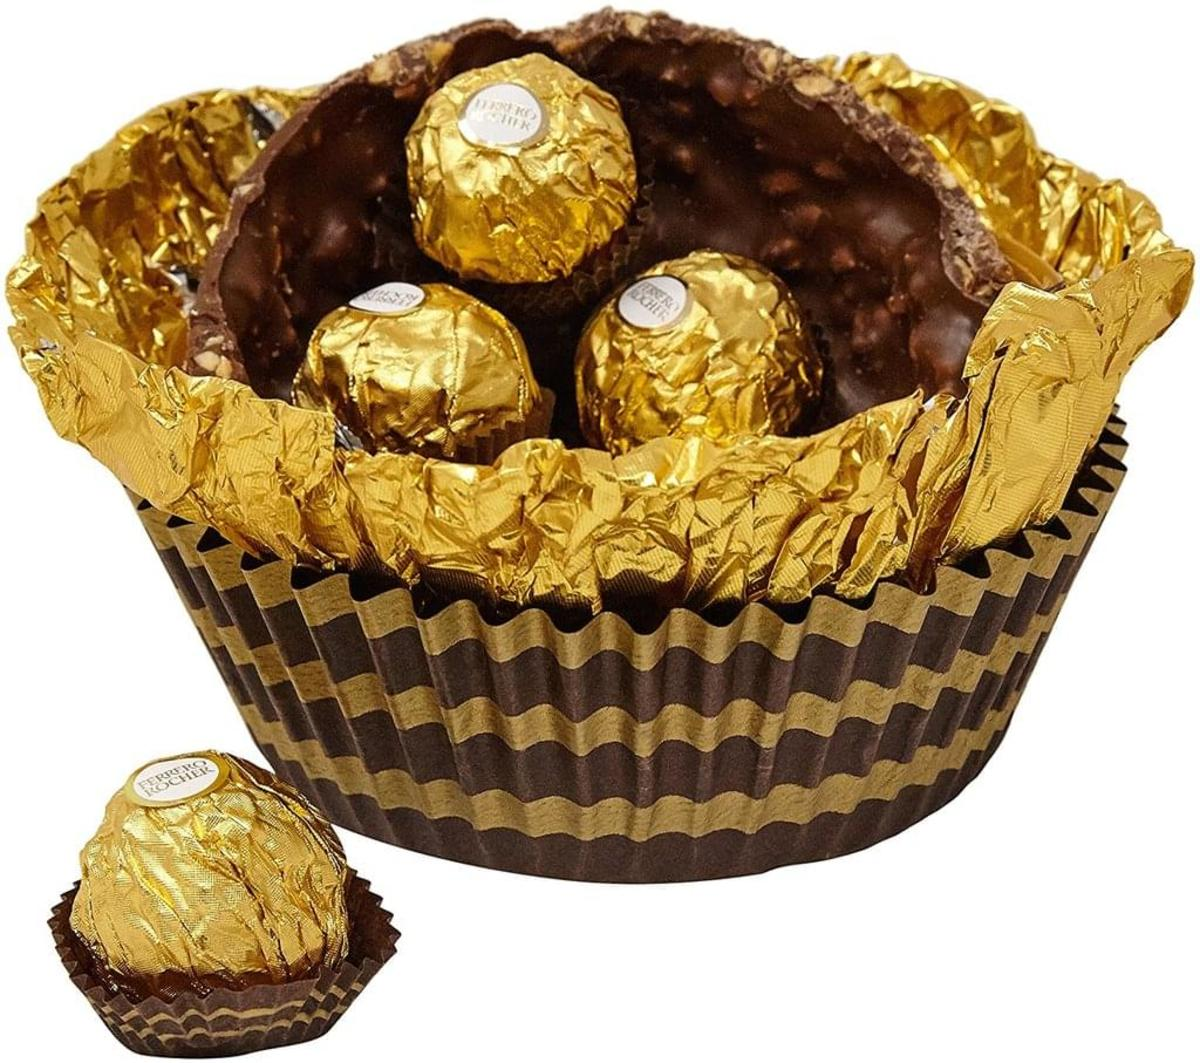 Bild 2 von Ferrero Grand Rocher 240g